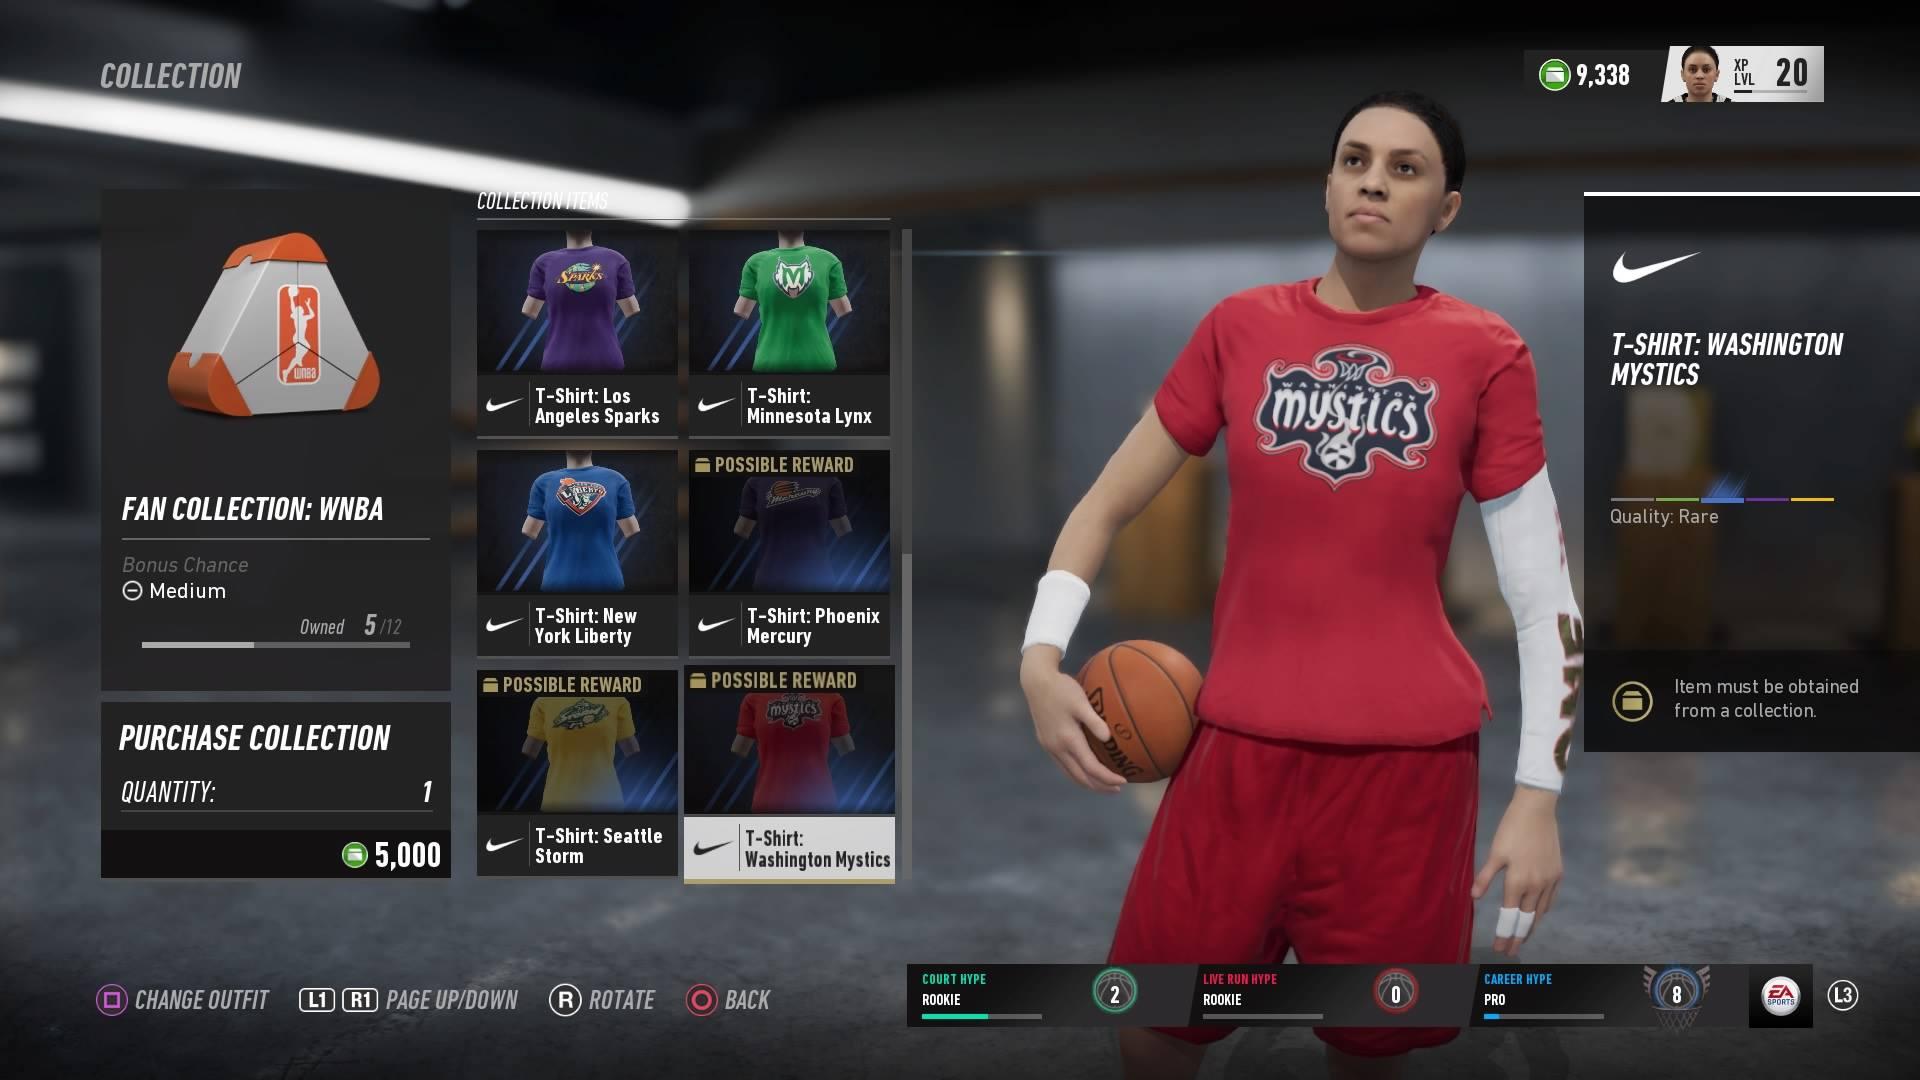 NBA Live 19 takes direct aim at NBA 2K19's grabby